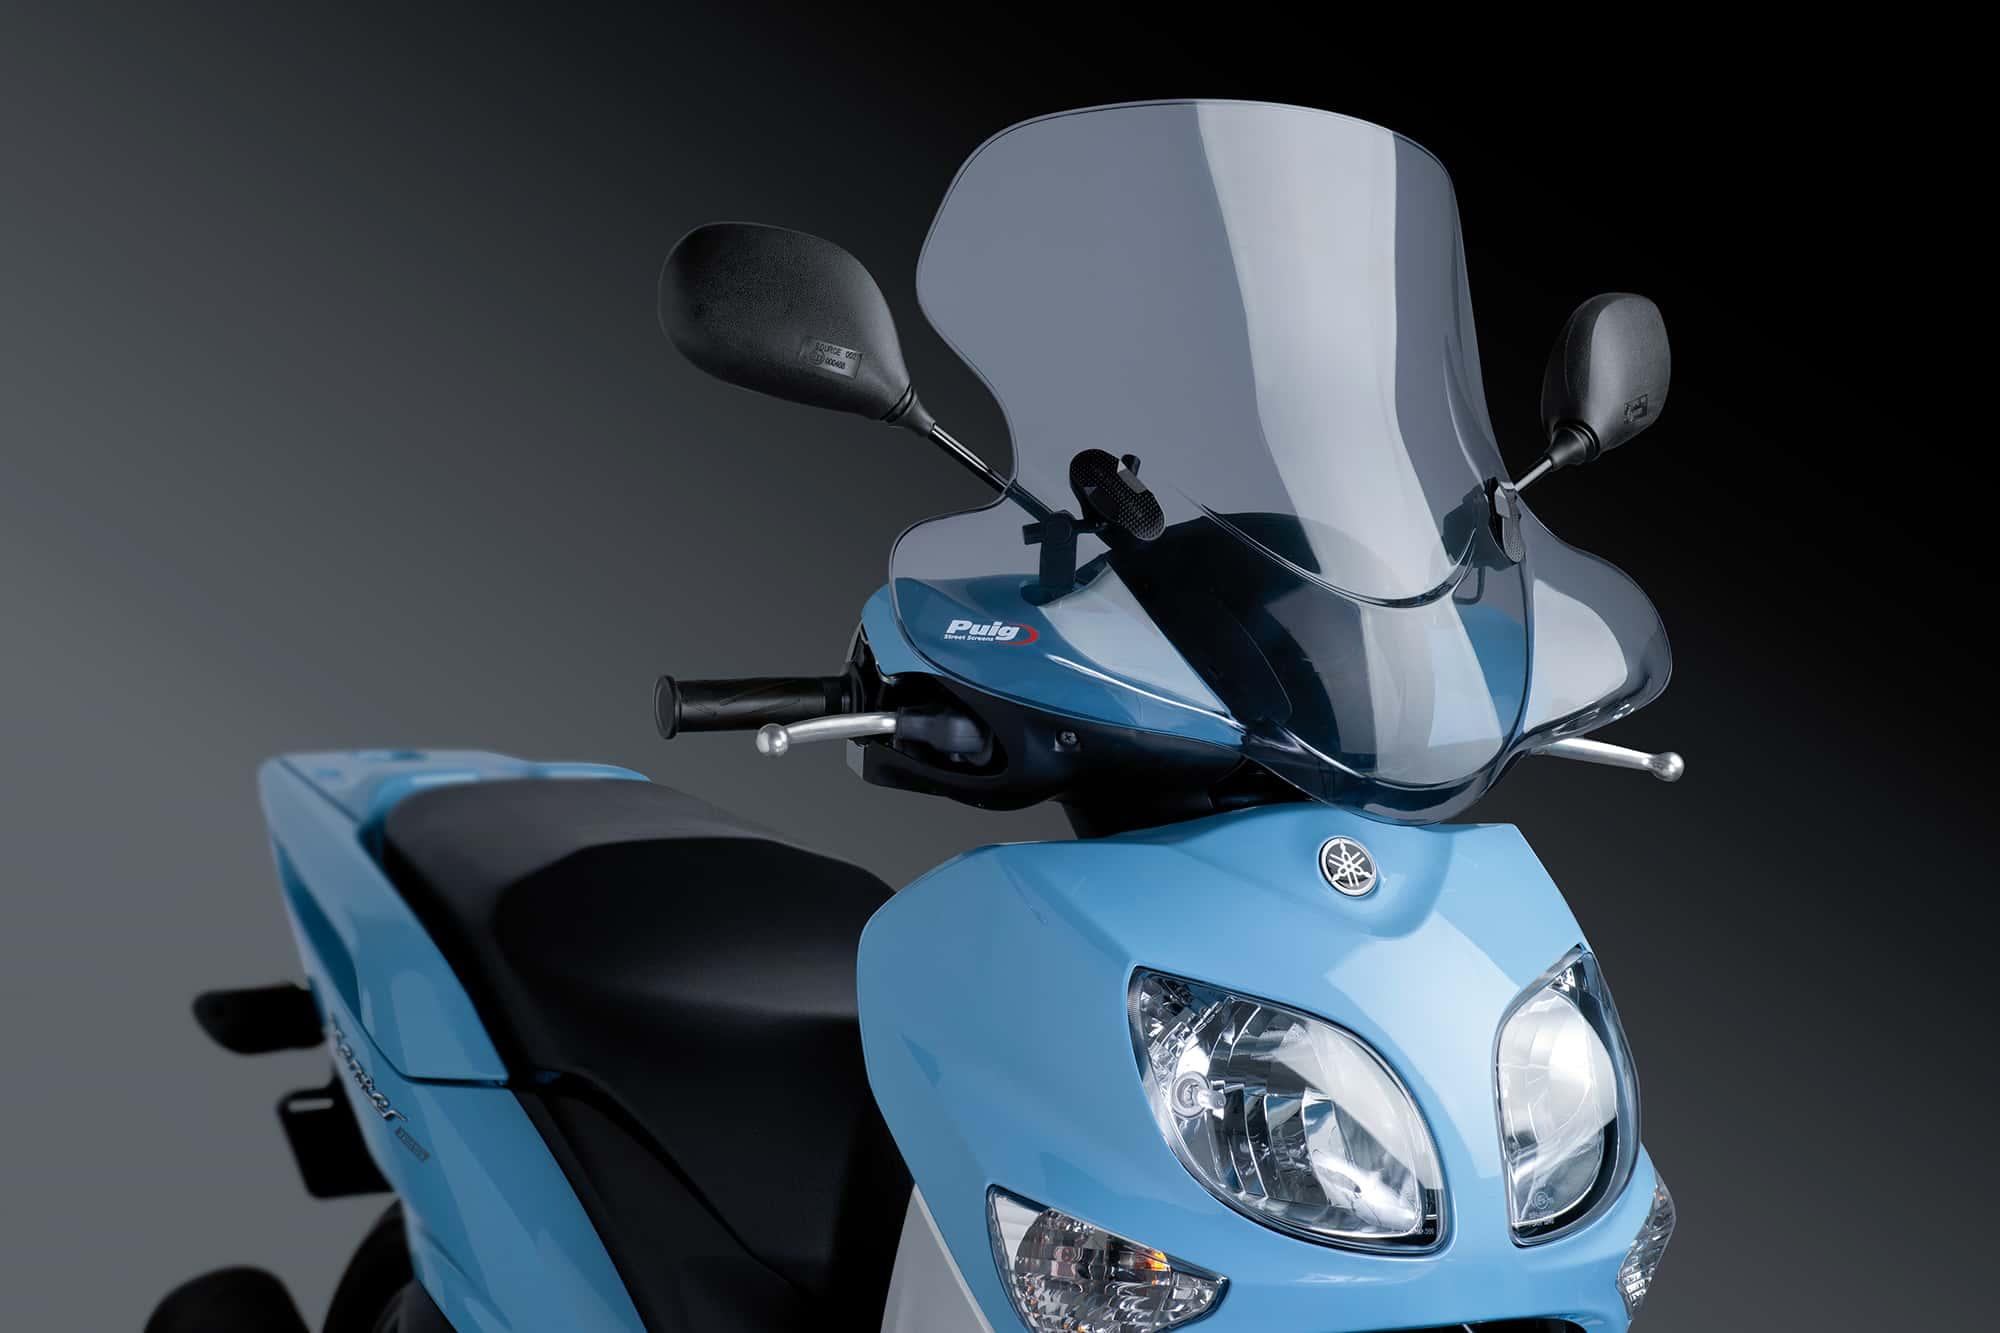 Cúpula Puig City Touring ahumado 0895 para moto SUZUKI ESTILETE 50 00-01